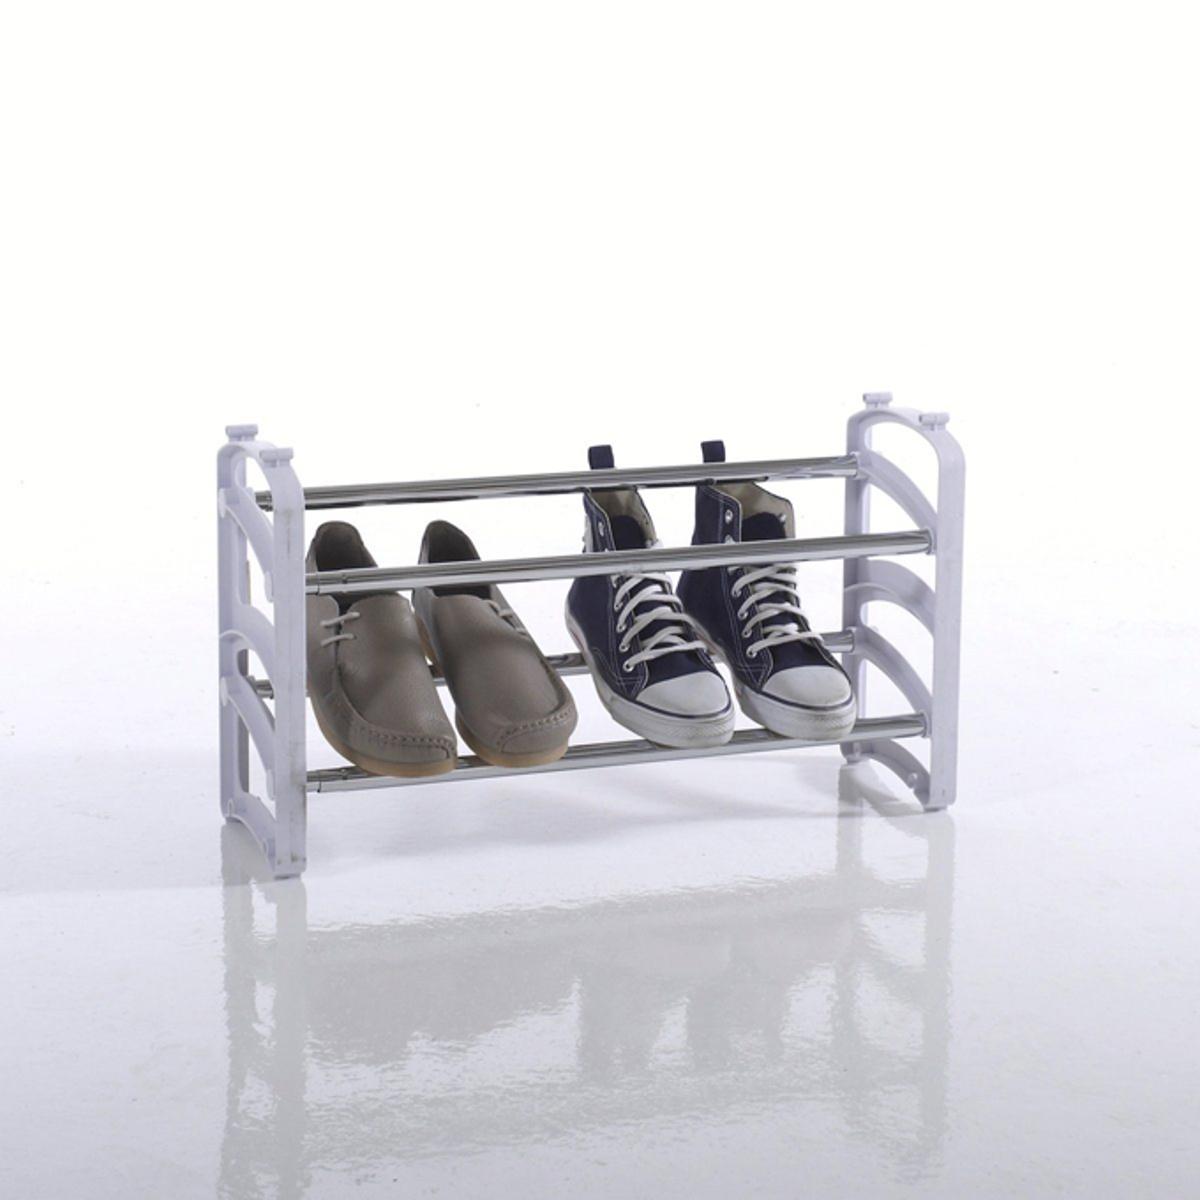 Полка для обуви раздвижная AMPILE